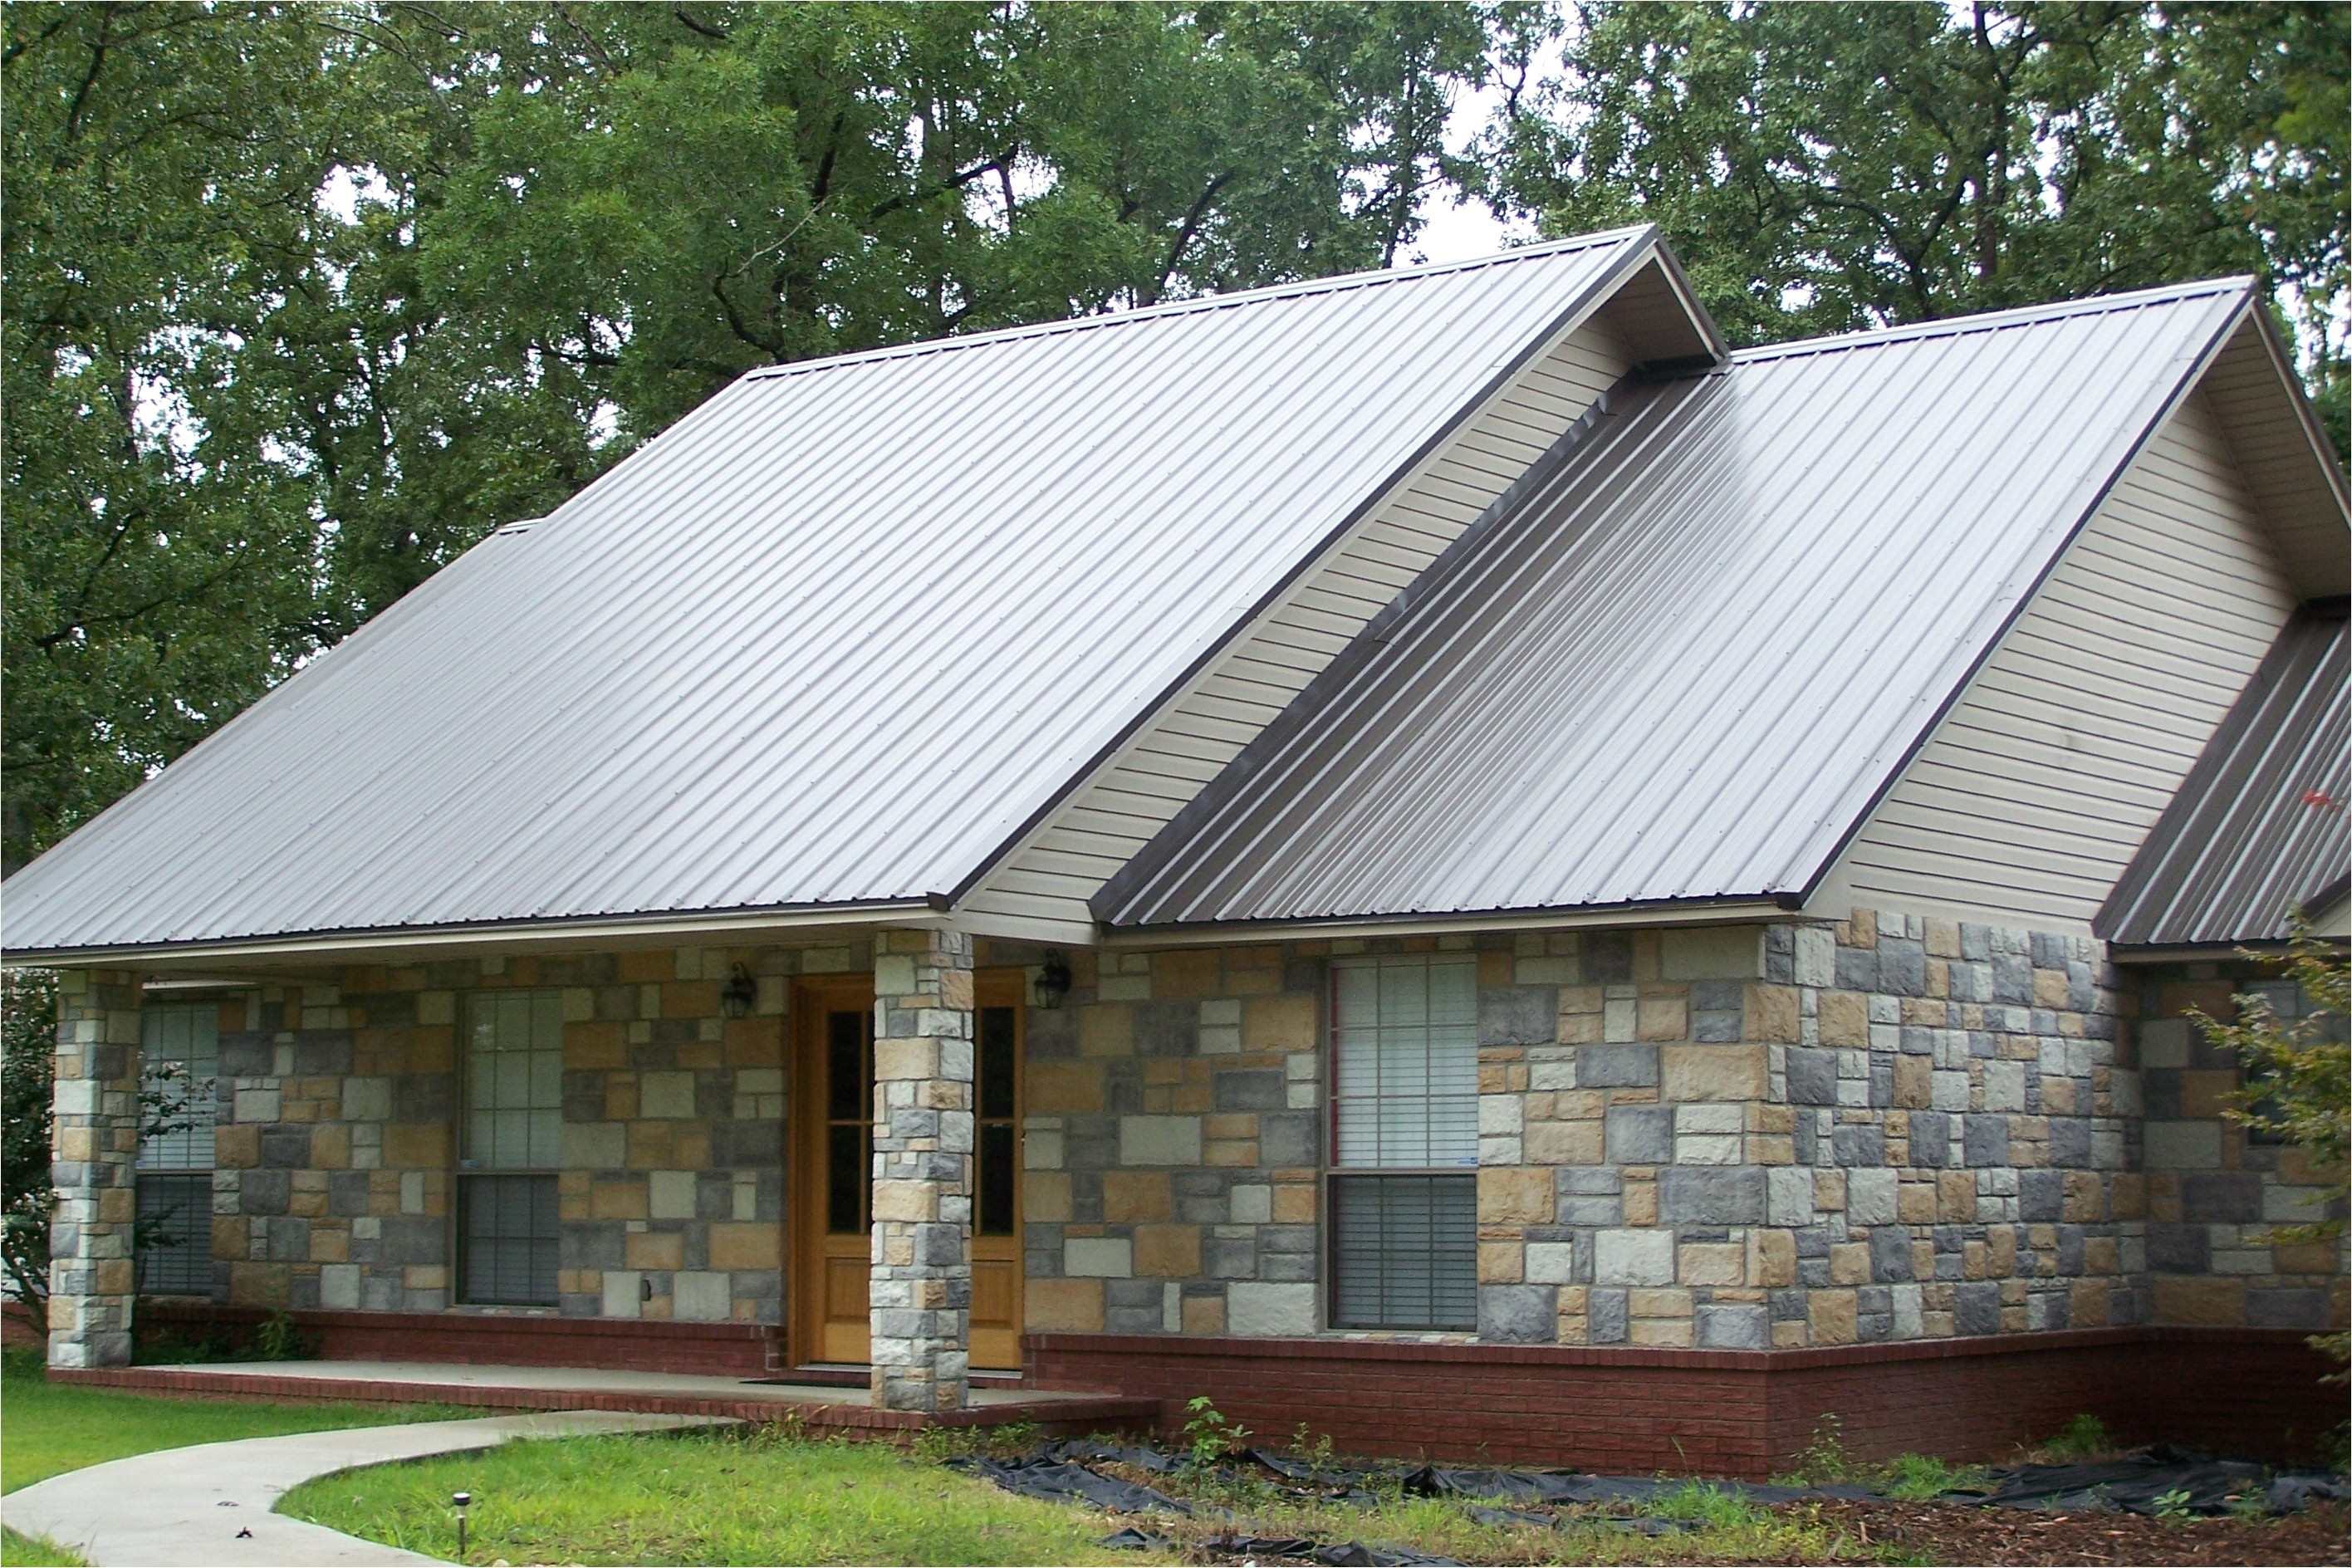 6379 metal roof beach house plans